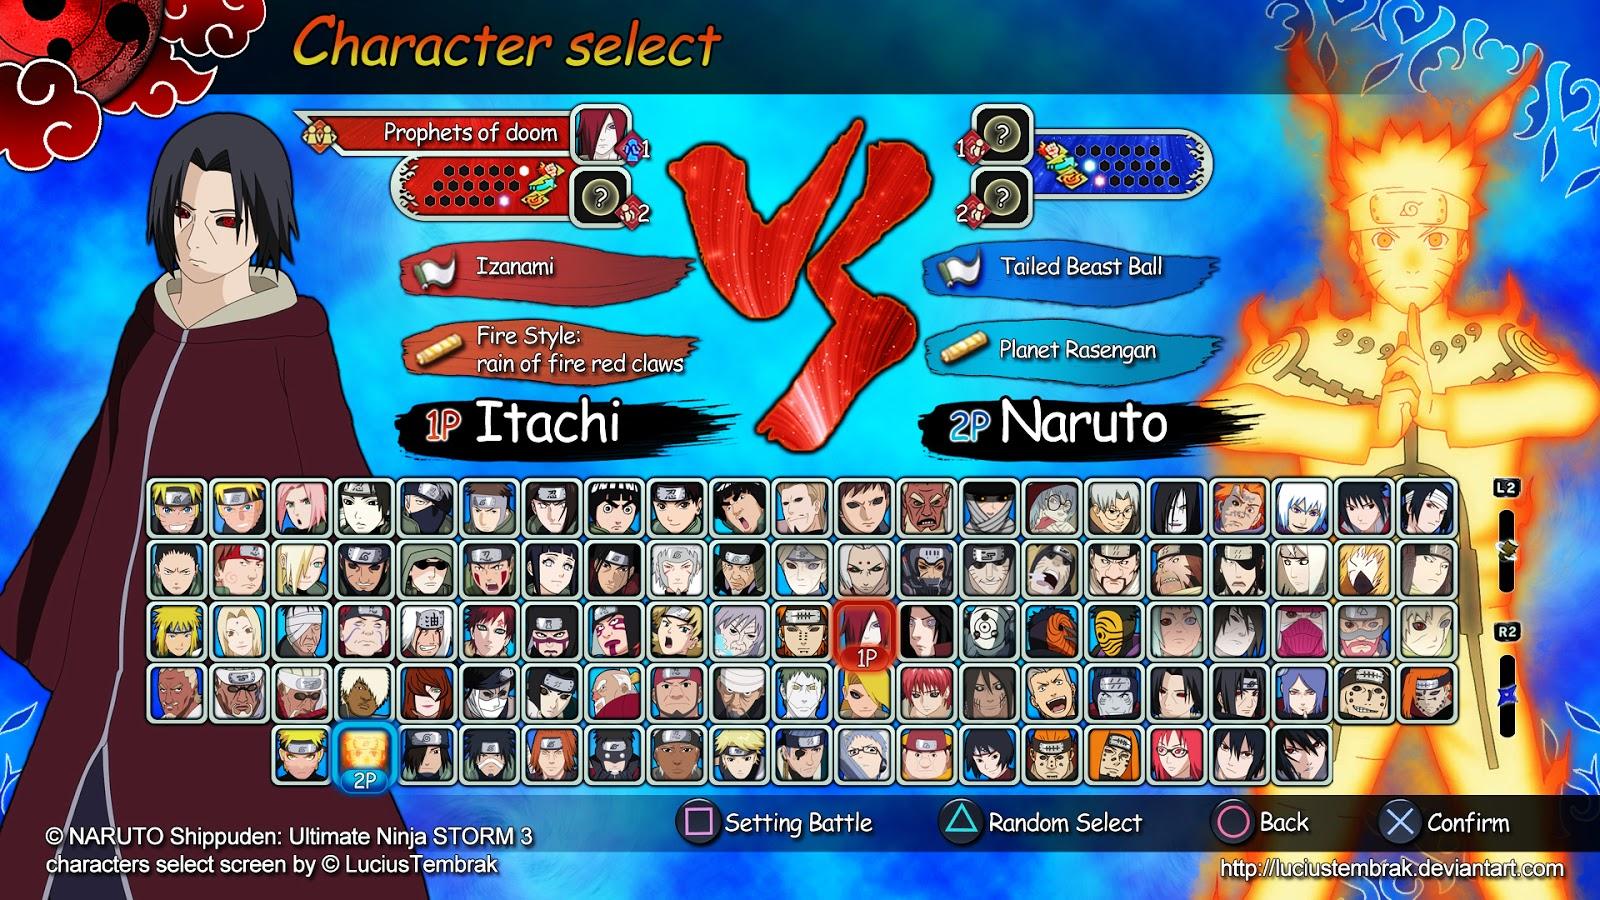 Naruto Shippuden Ultimate Ninja Storm 3YA ANUNCIADO